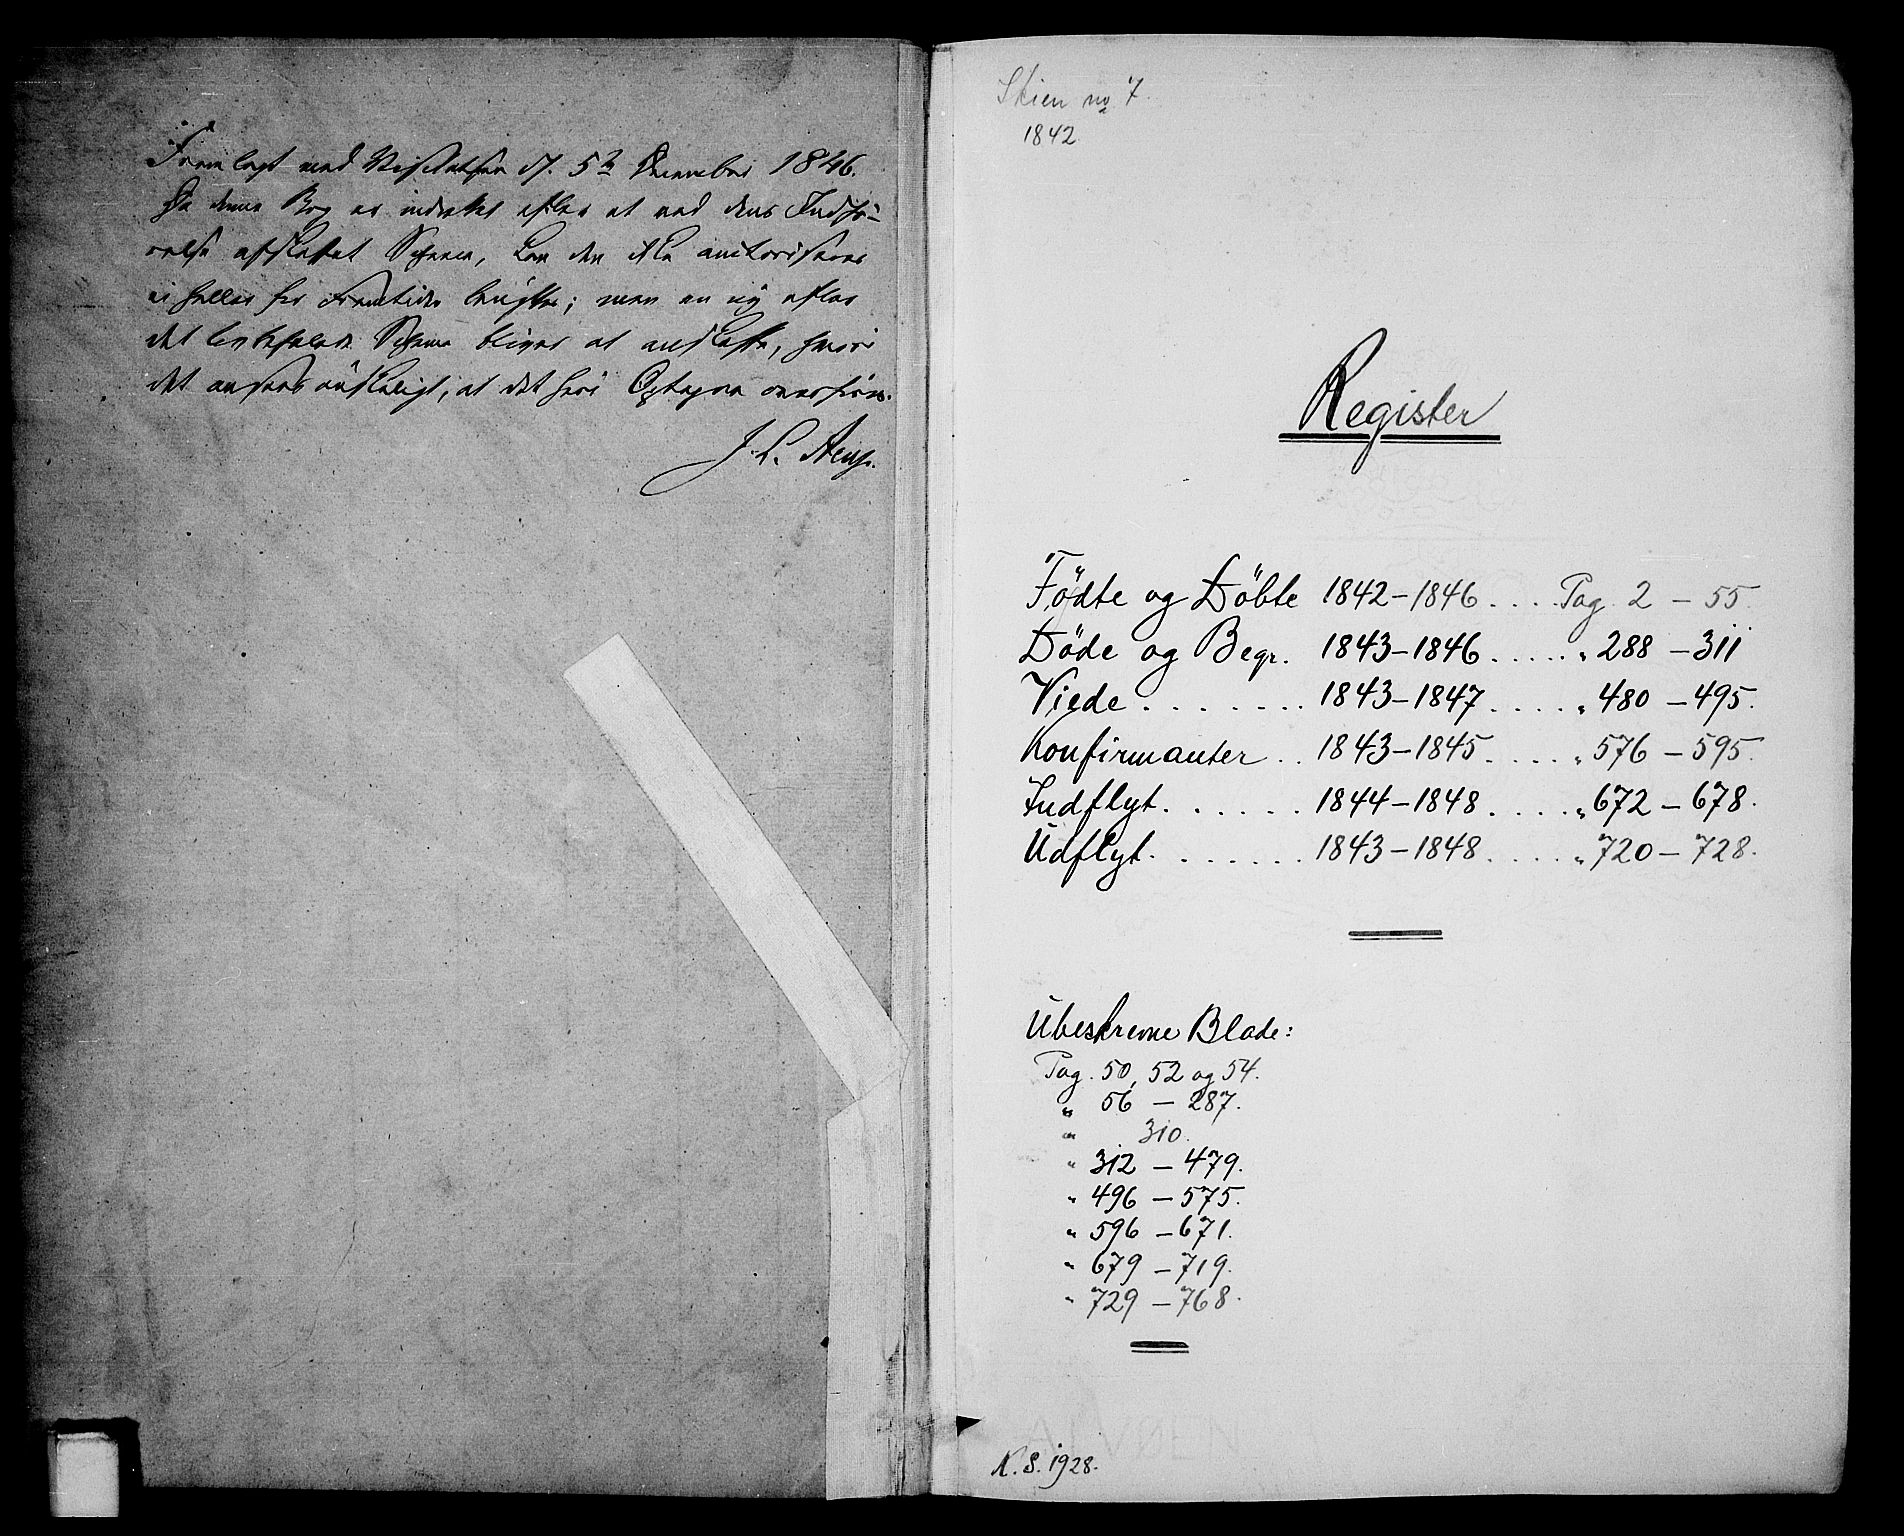 SAKO, Skien kirkebøker, G/Ga/L0003: Klokkerbok nr. 3, 1843-1847